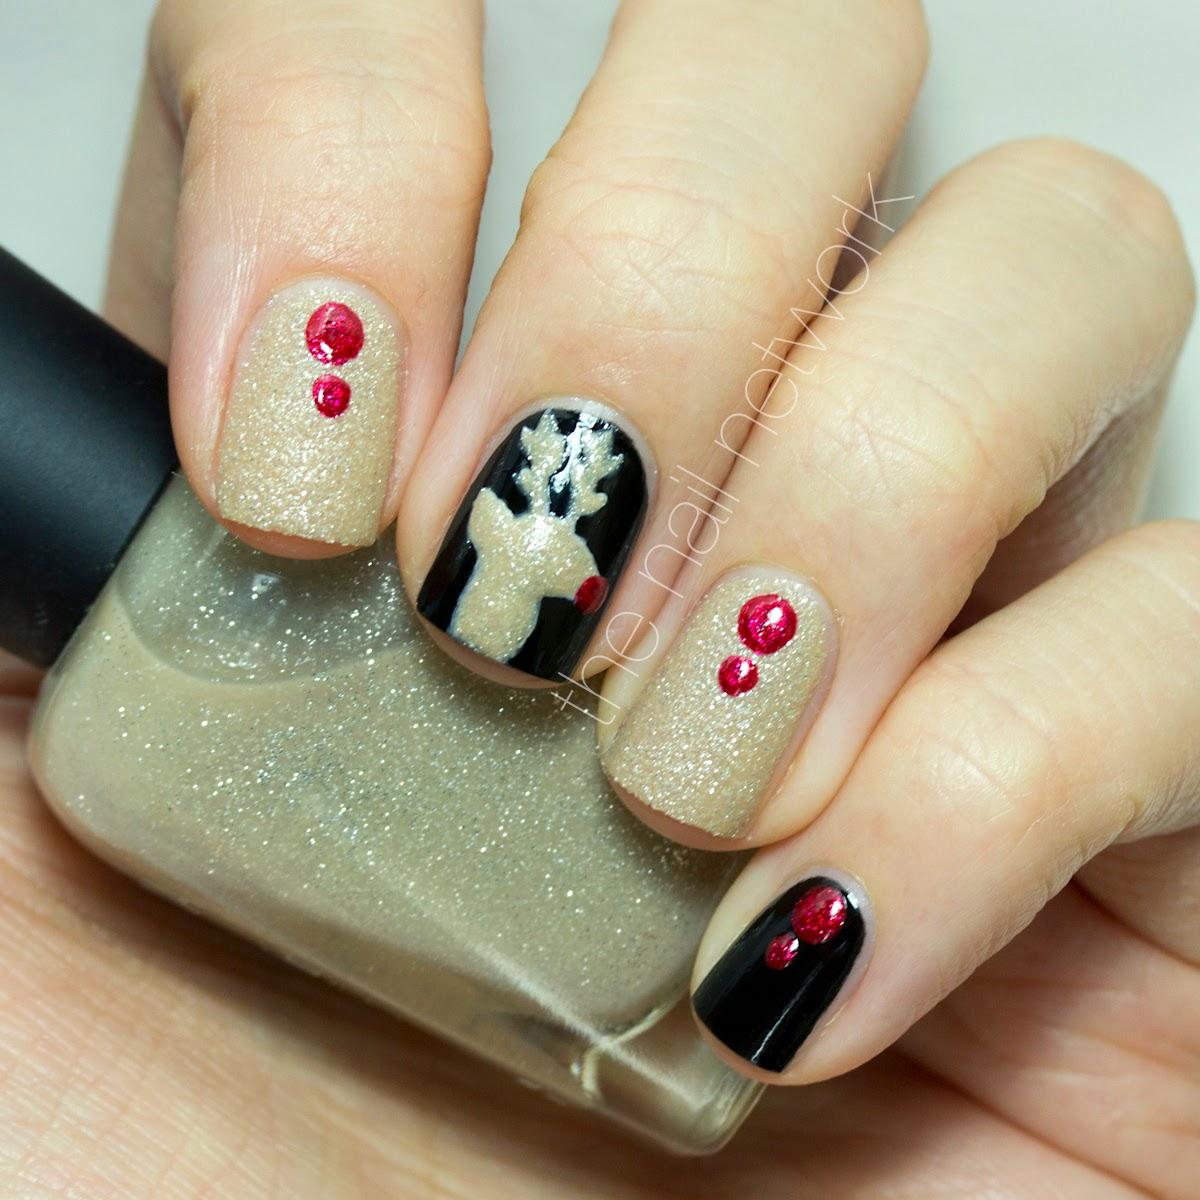 TDOCNAS 2014: Day 11: Glittery Reindeer Nail Art